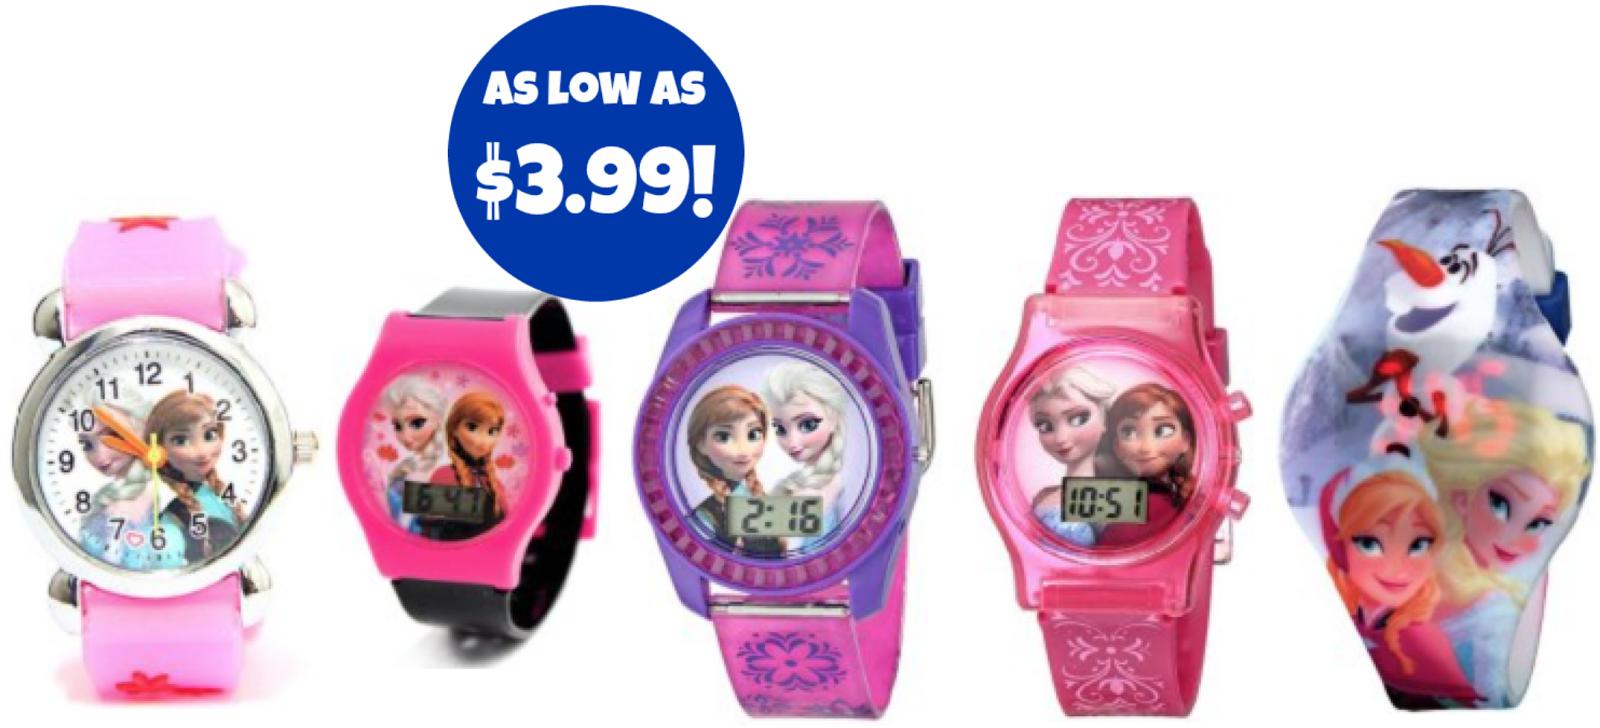 http://www.thebinderladies.com/2014/12/amazon-disney-frozen-watches-as-low-as.html